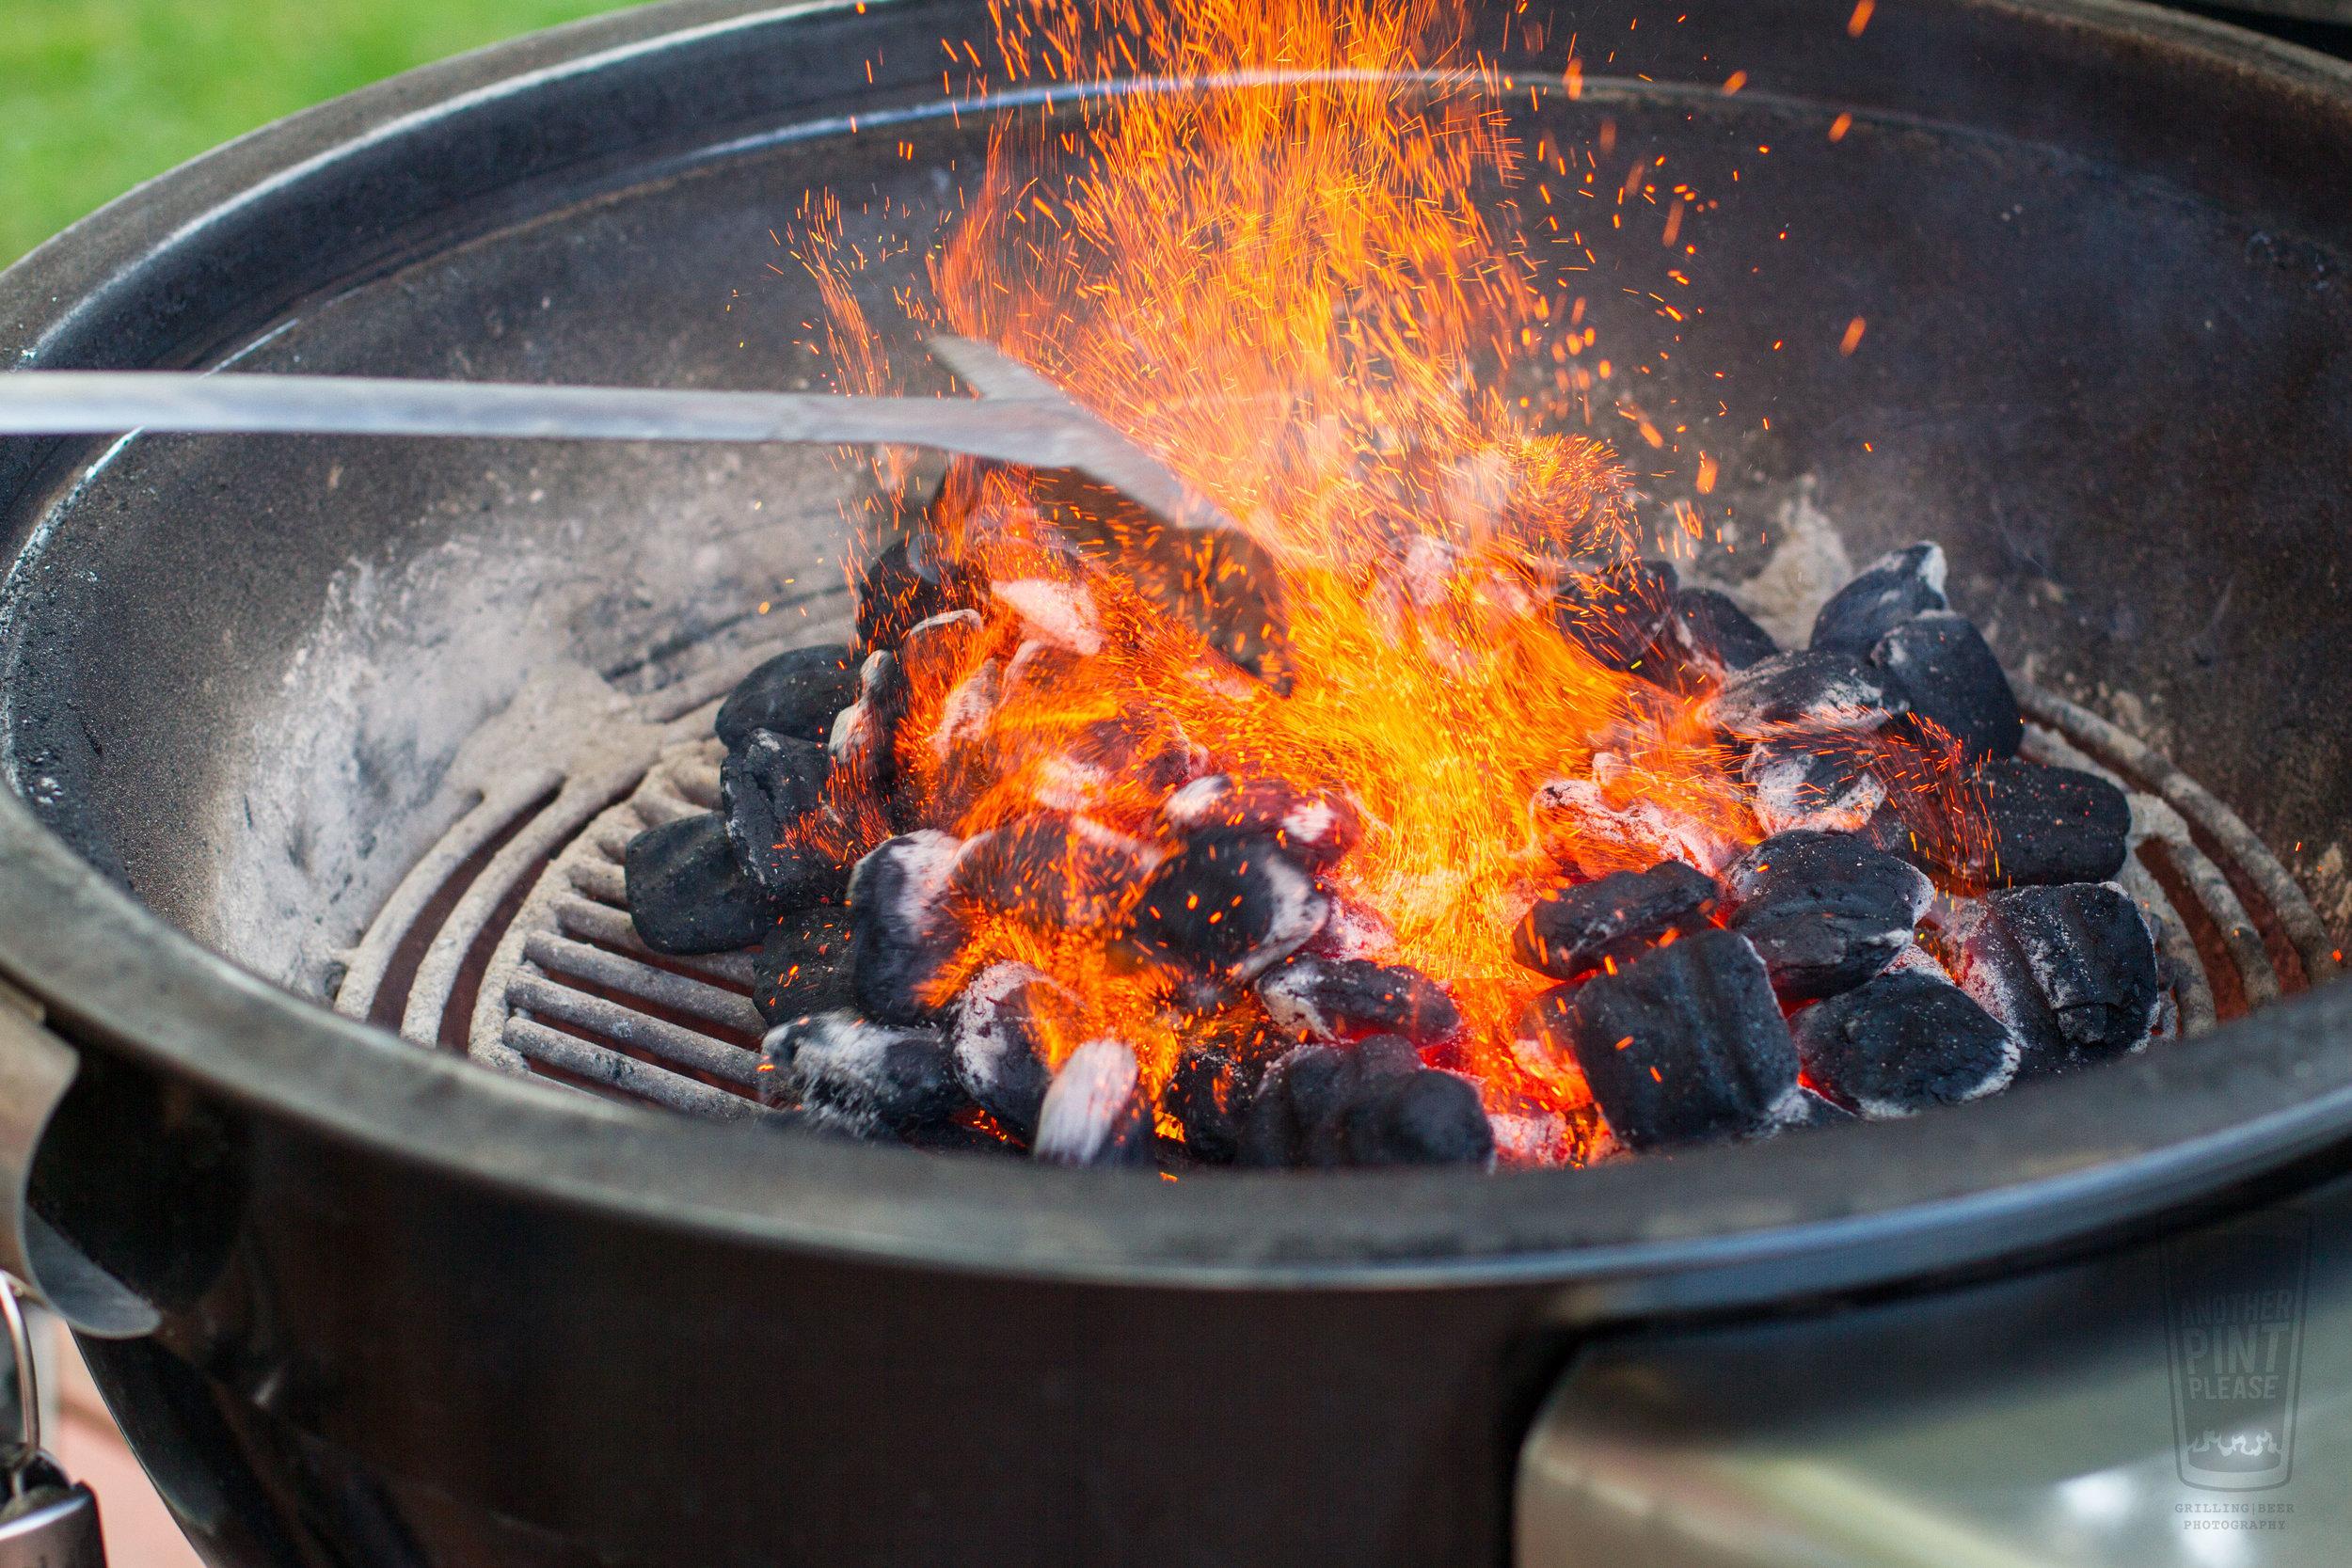 raking coals on weber summit charcoal grill.jpg